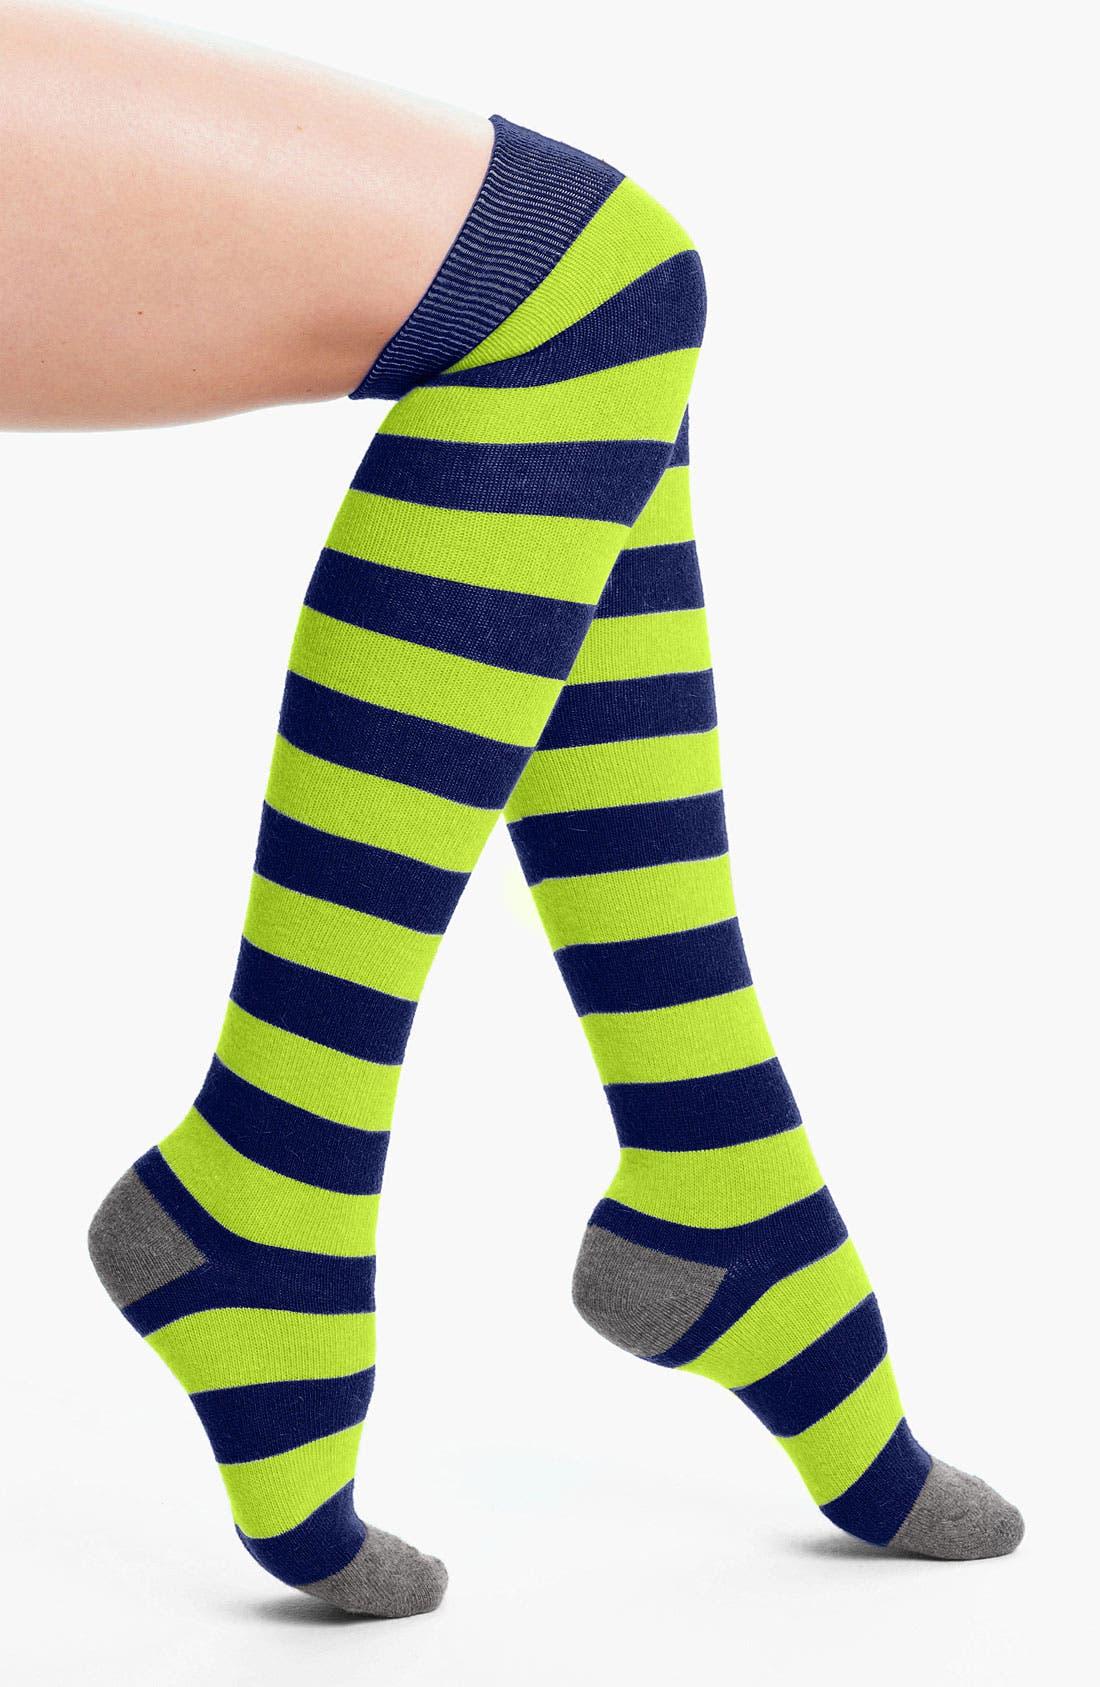 Alternate Image 1 Selected - Make + Model 'Candy Stripe' Over the Knee Socks